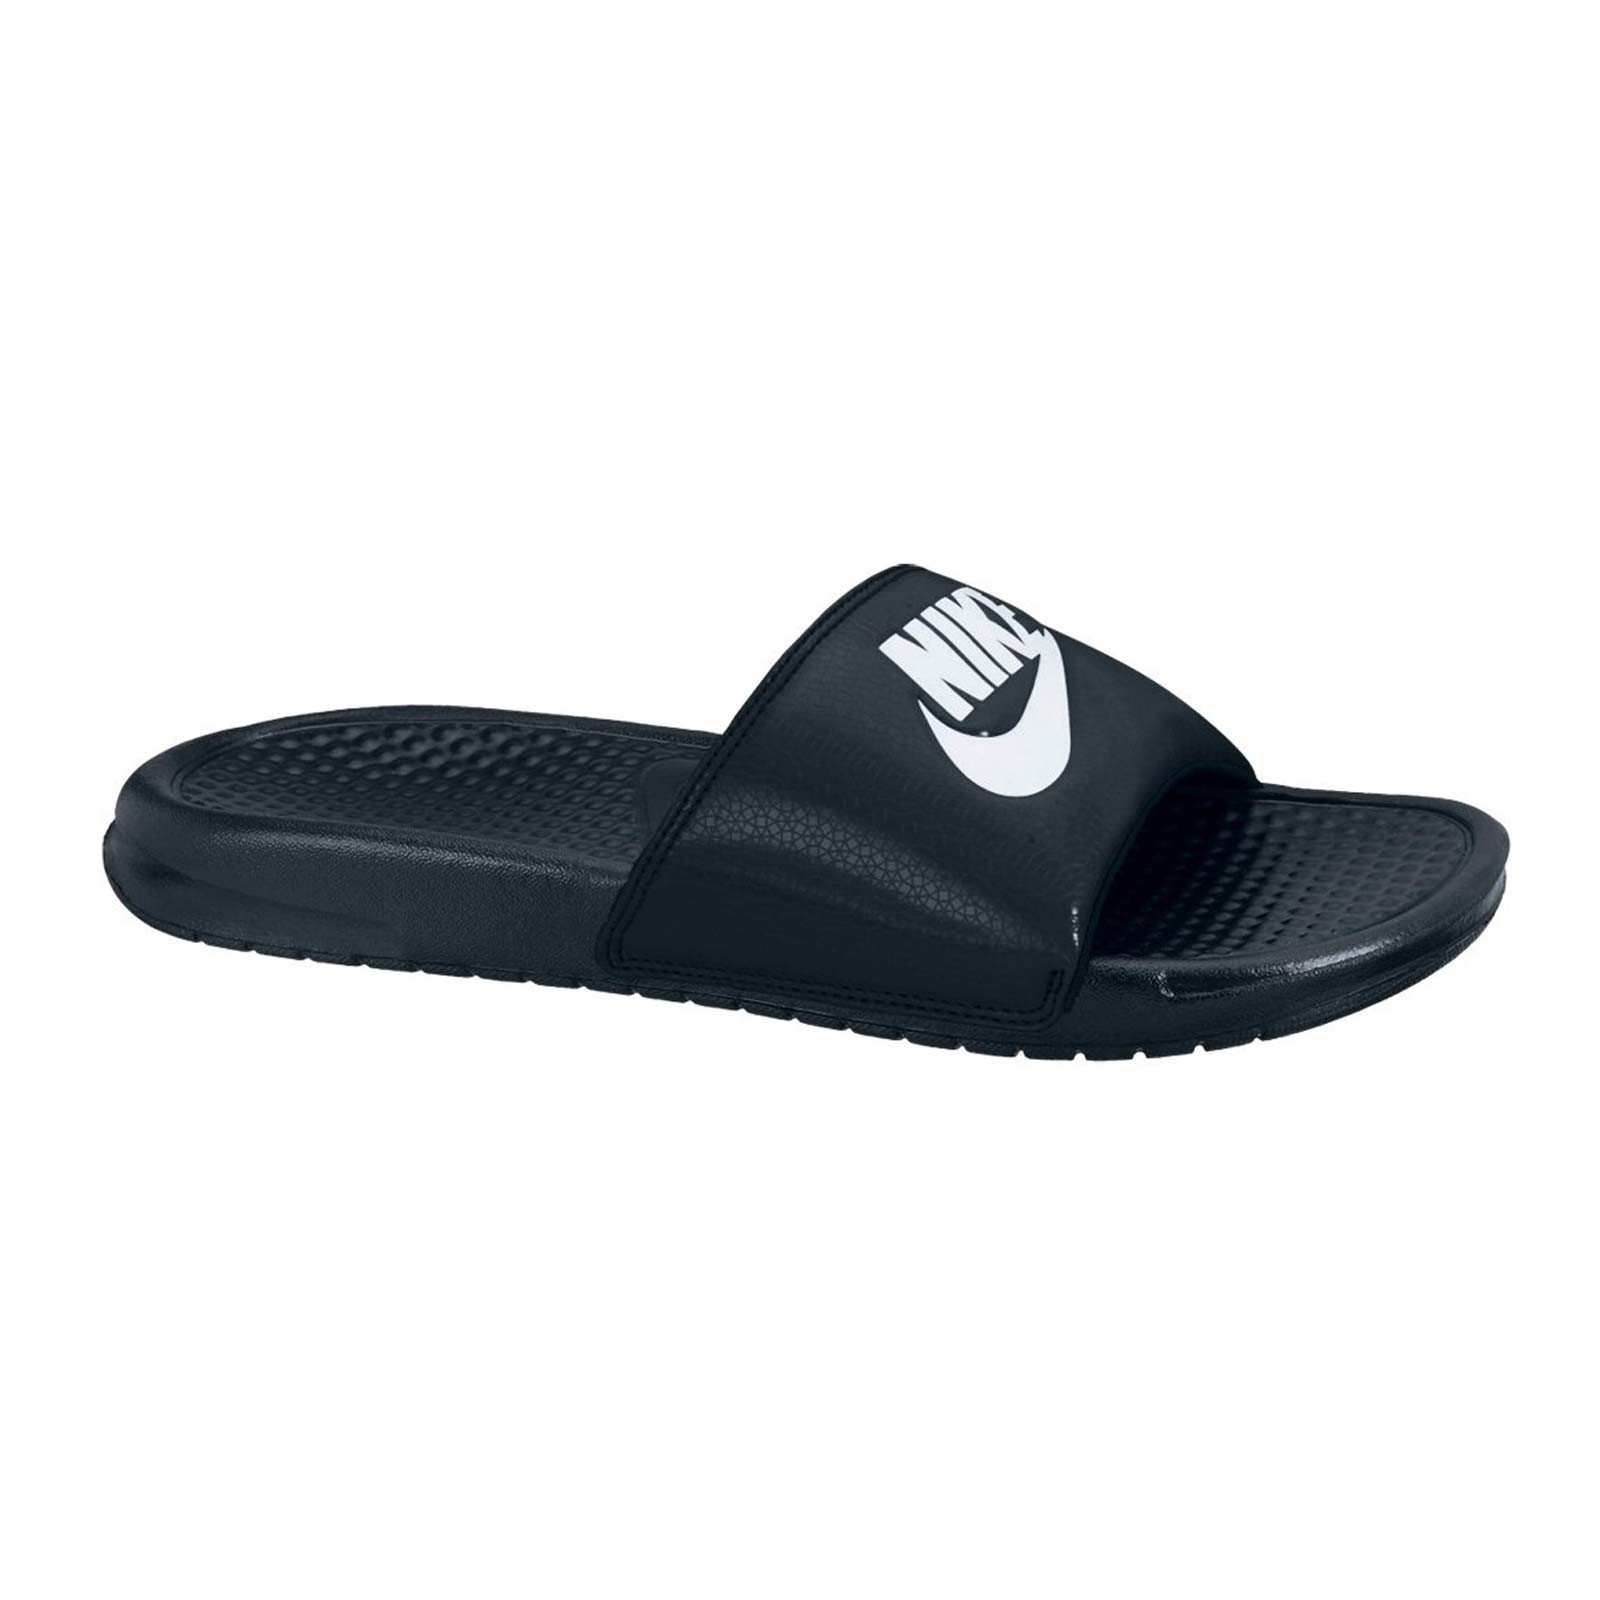 Sandalias Nike Benassi Jdi Sportswear para Hombre